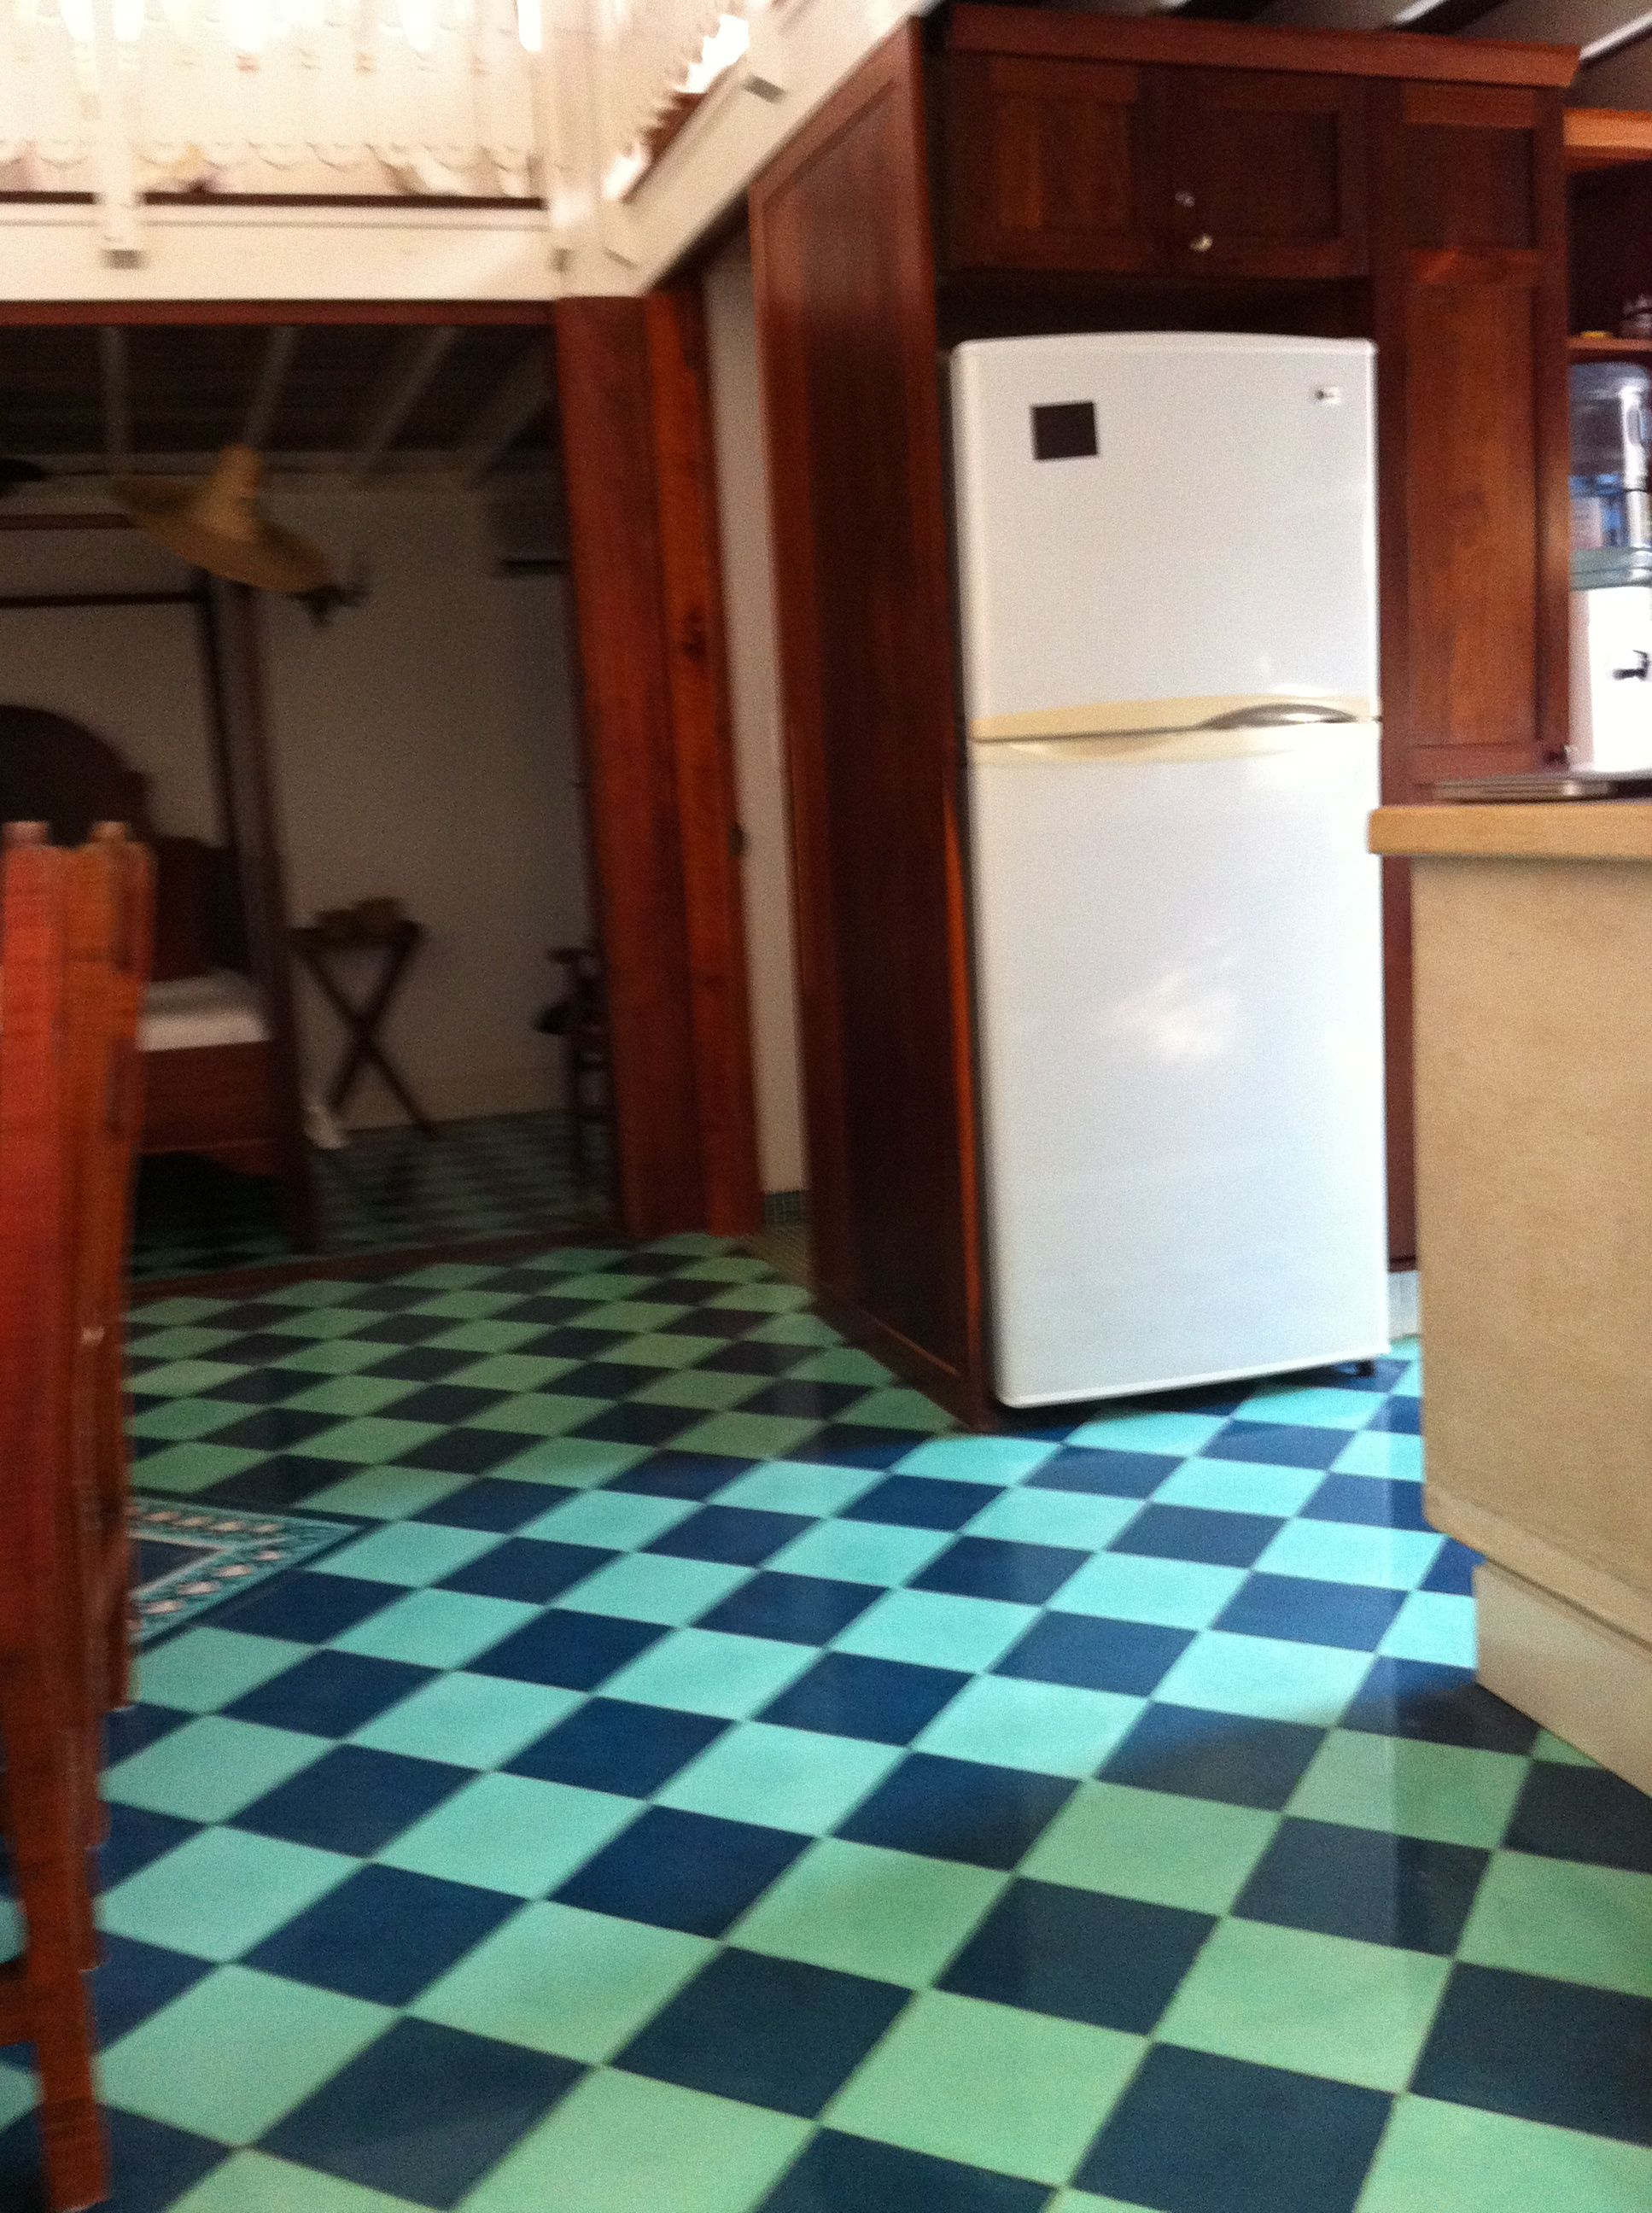 Checkerboard floor in hues of blue checkerboard floors checkerboard floor in hues of blue dailygadgetfo Gallery